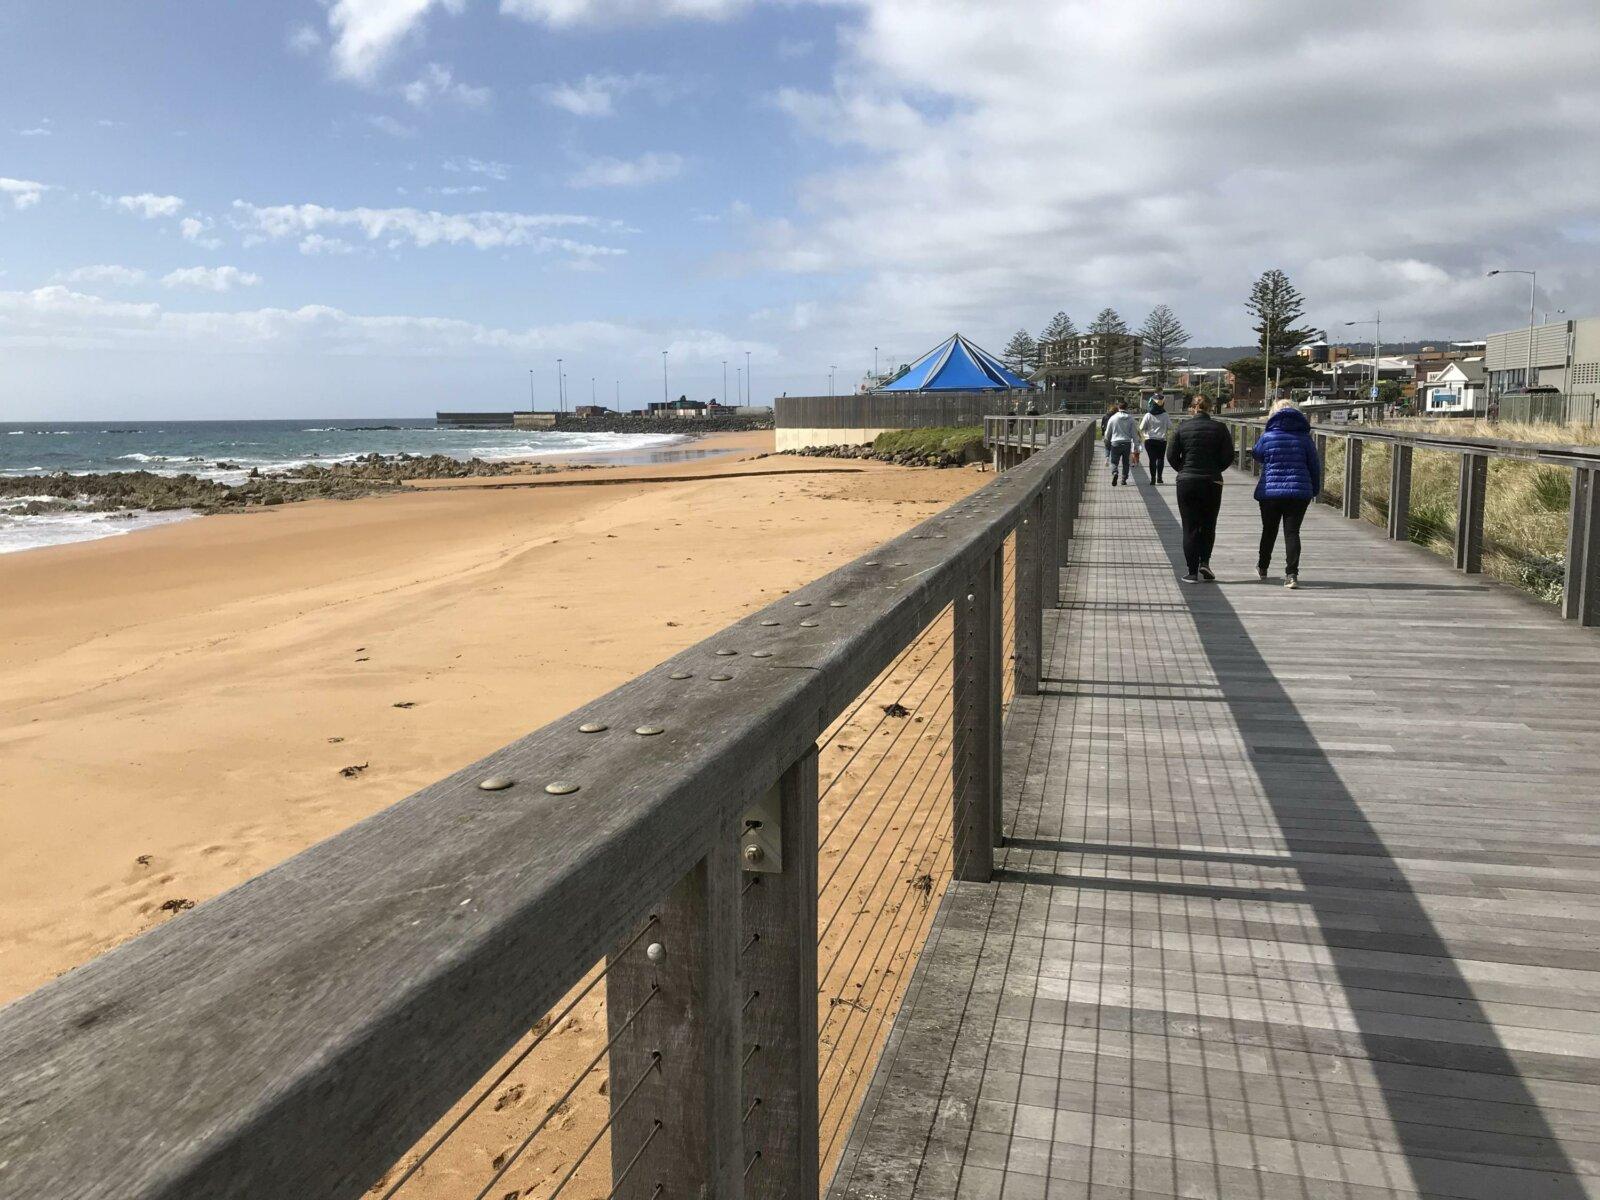 Boardwalk at Burnie